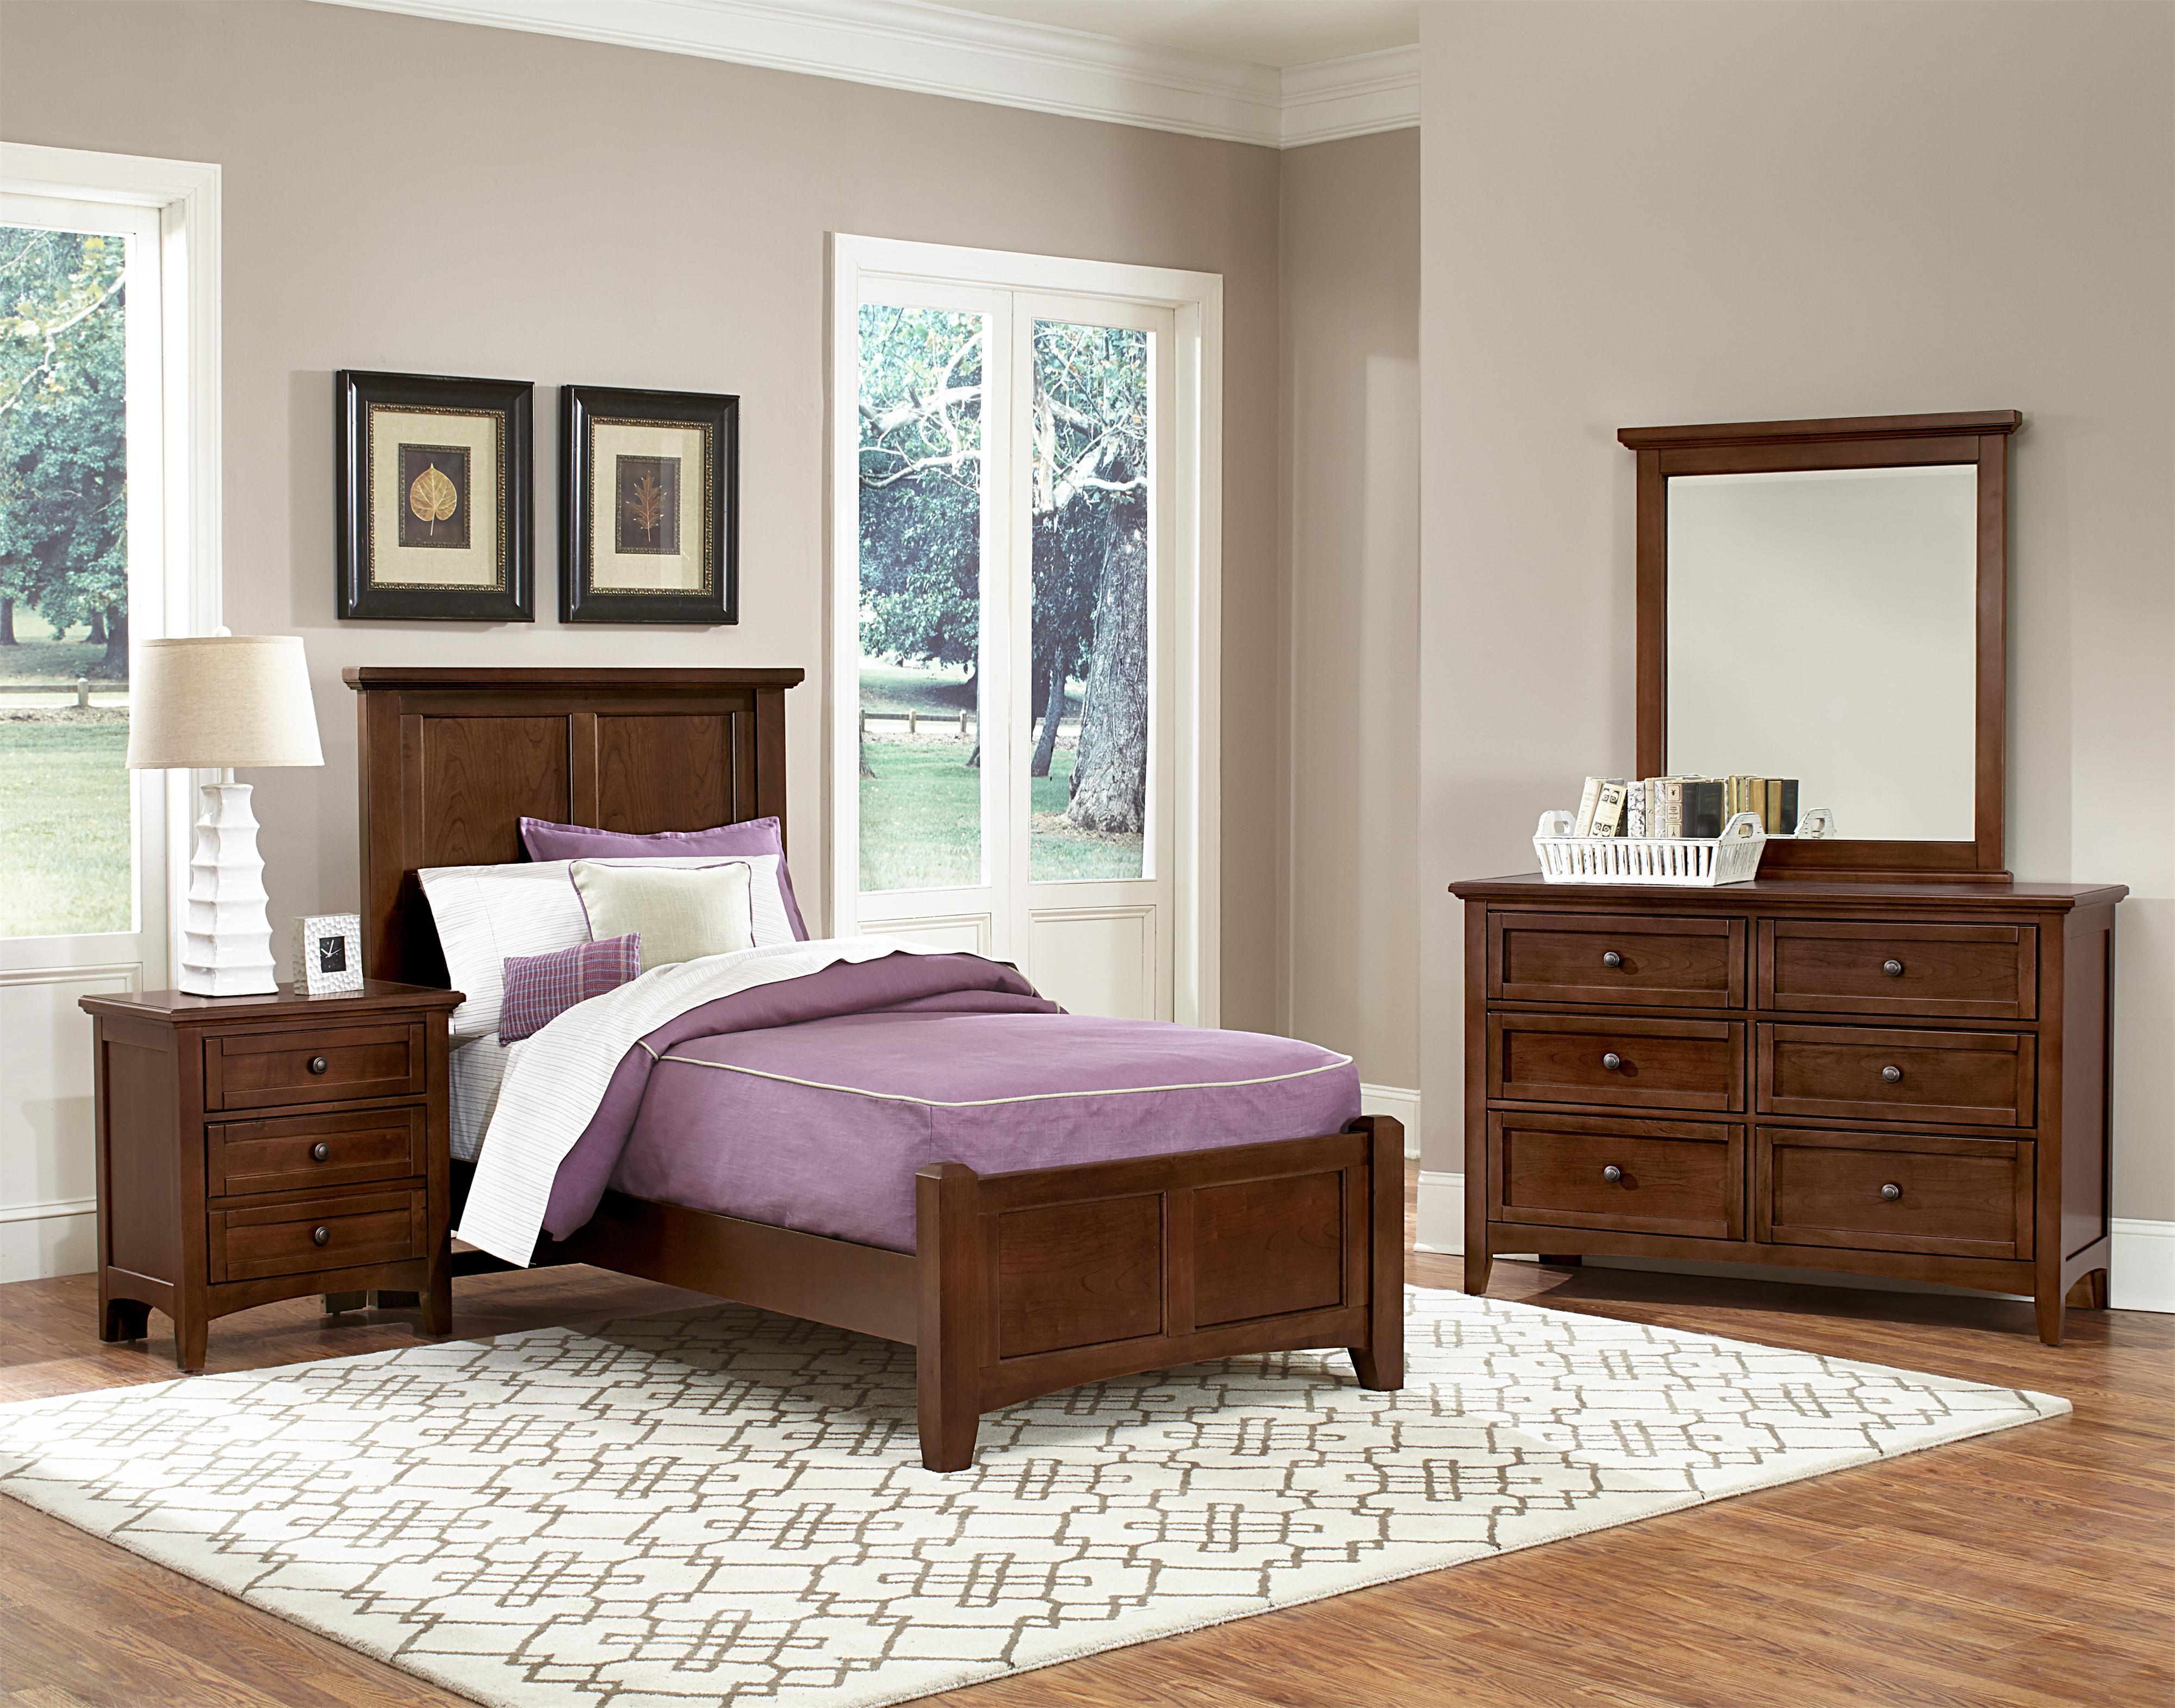 vaughan bassett bonanza twin bedroom group olinde 39 s furniture bedroom groups. Black Bedroom Furniture Sets. Home Design Ideas